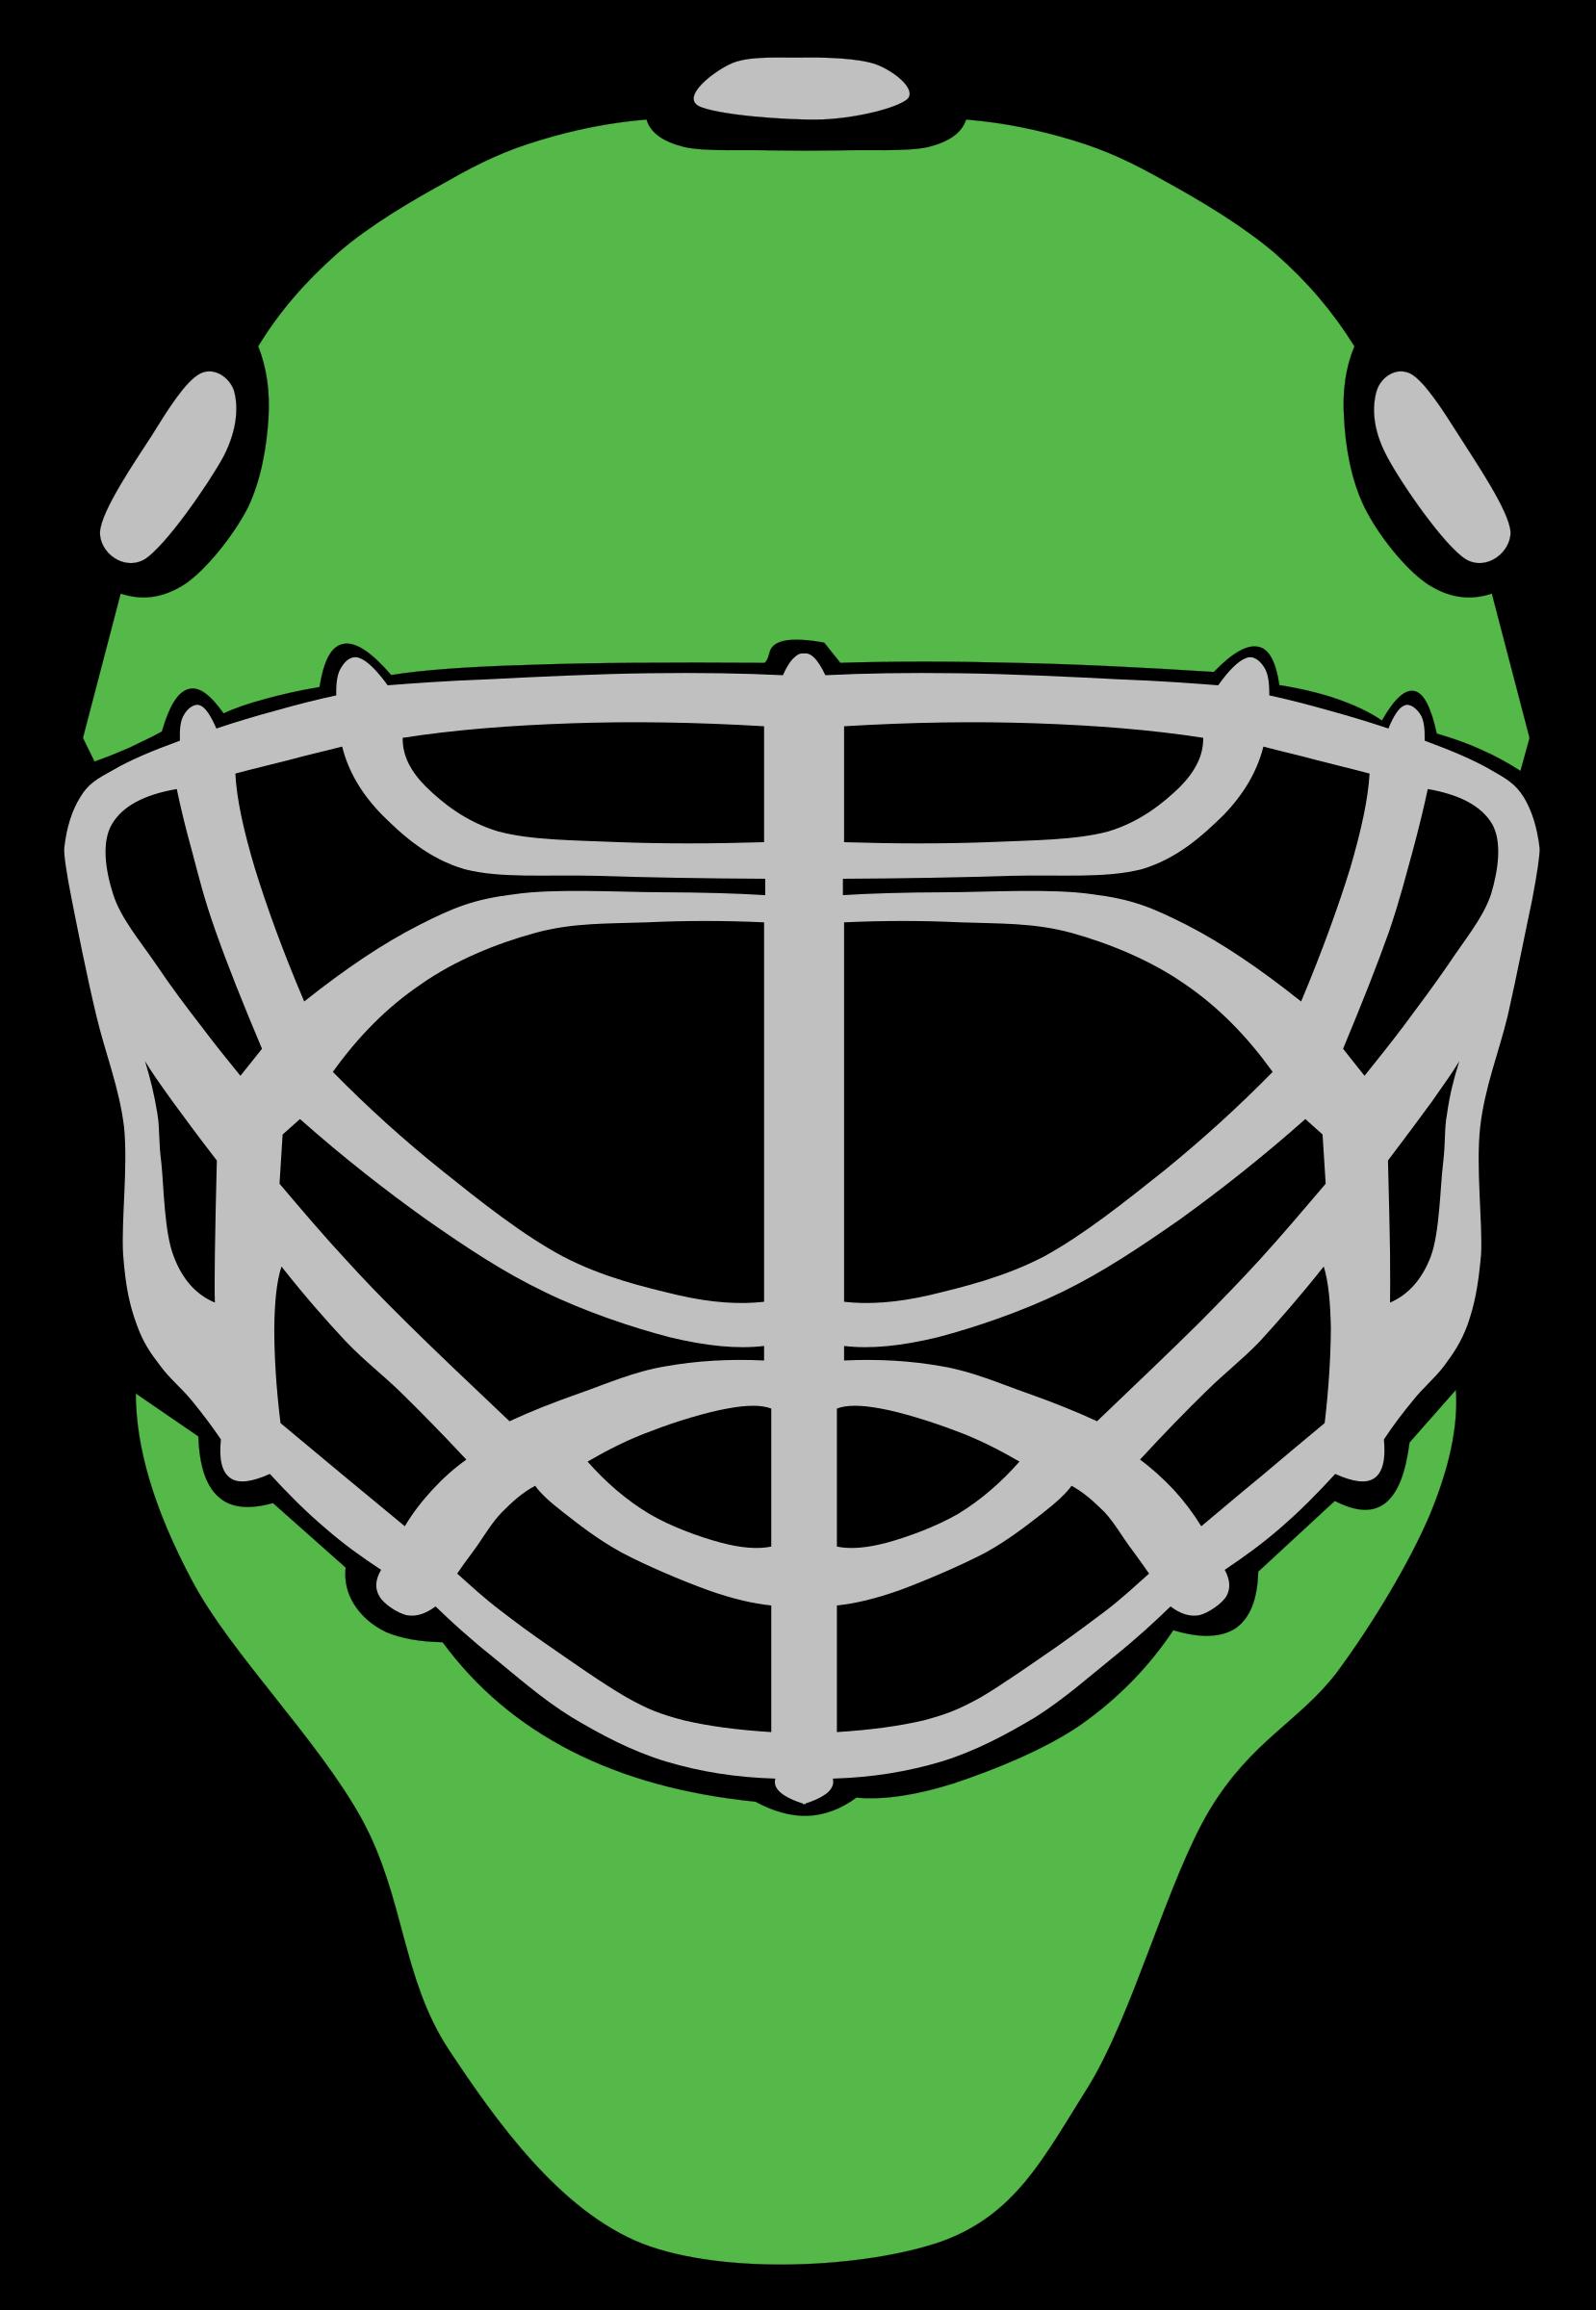 Hockey clipart goaltender. Goalie mask simple big